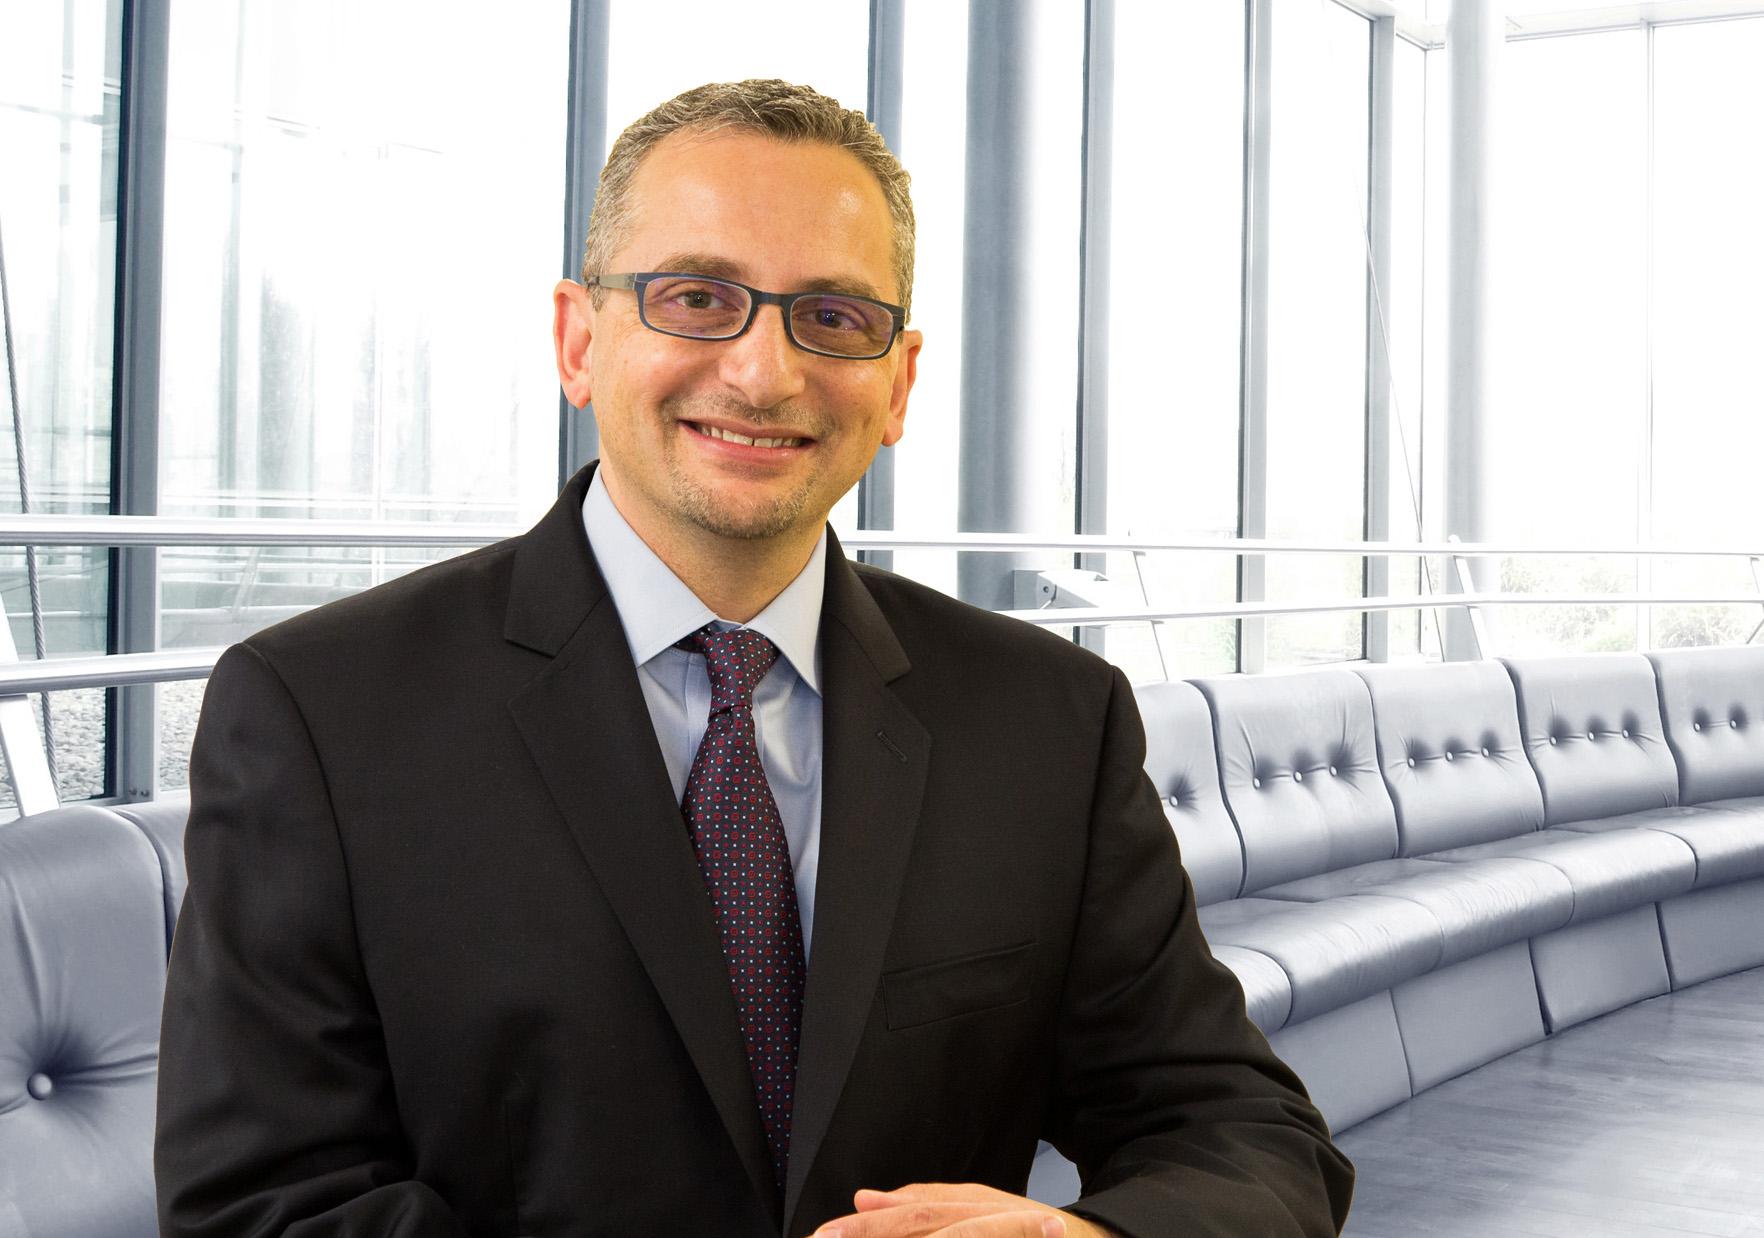 Ayman Aboushala, DMD, MS